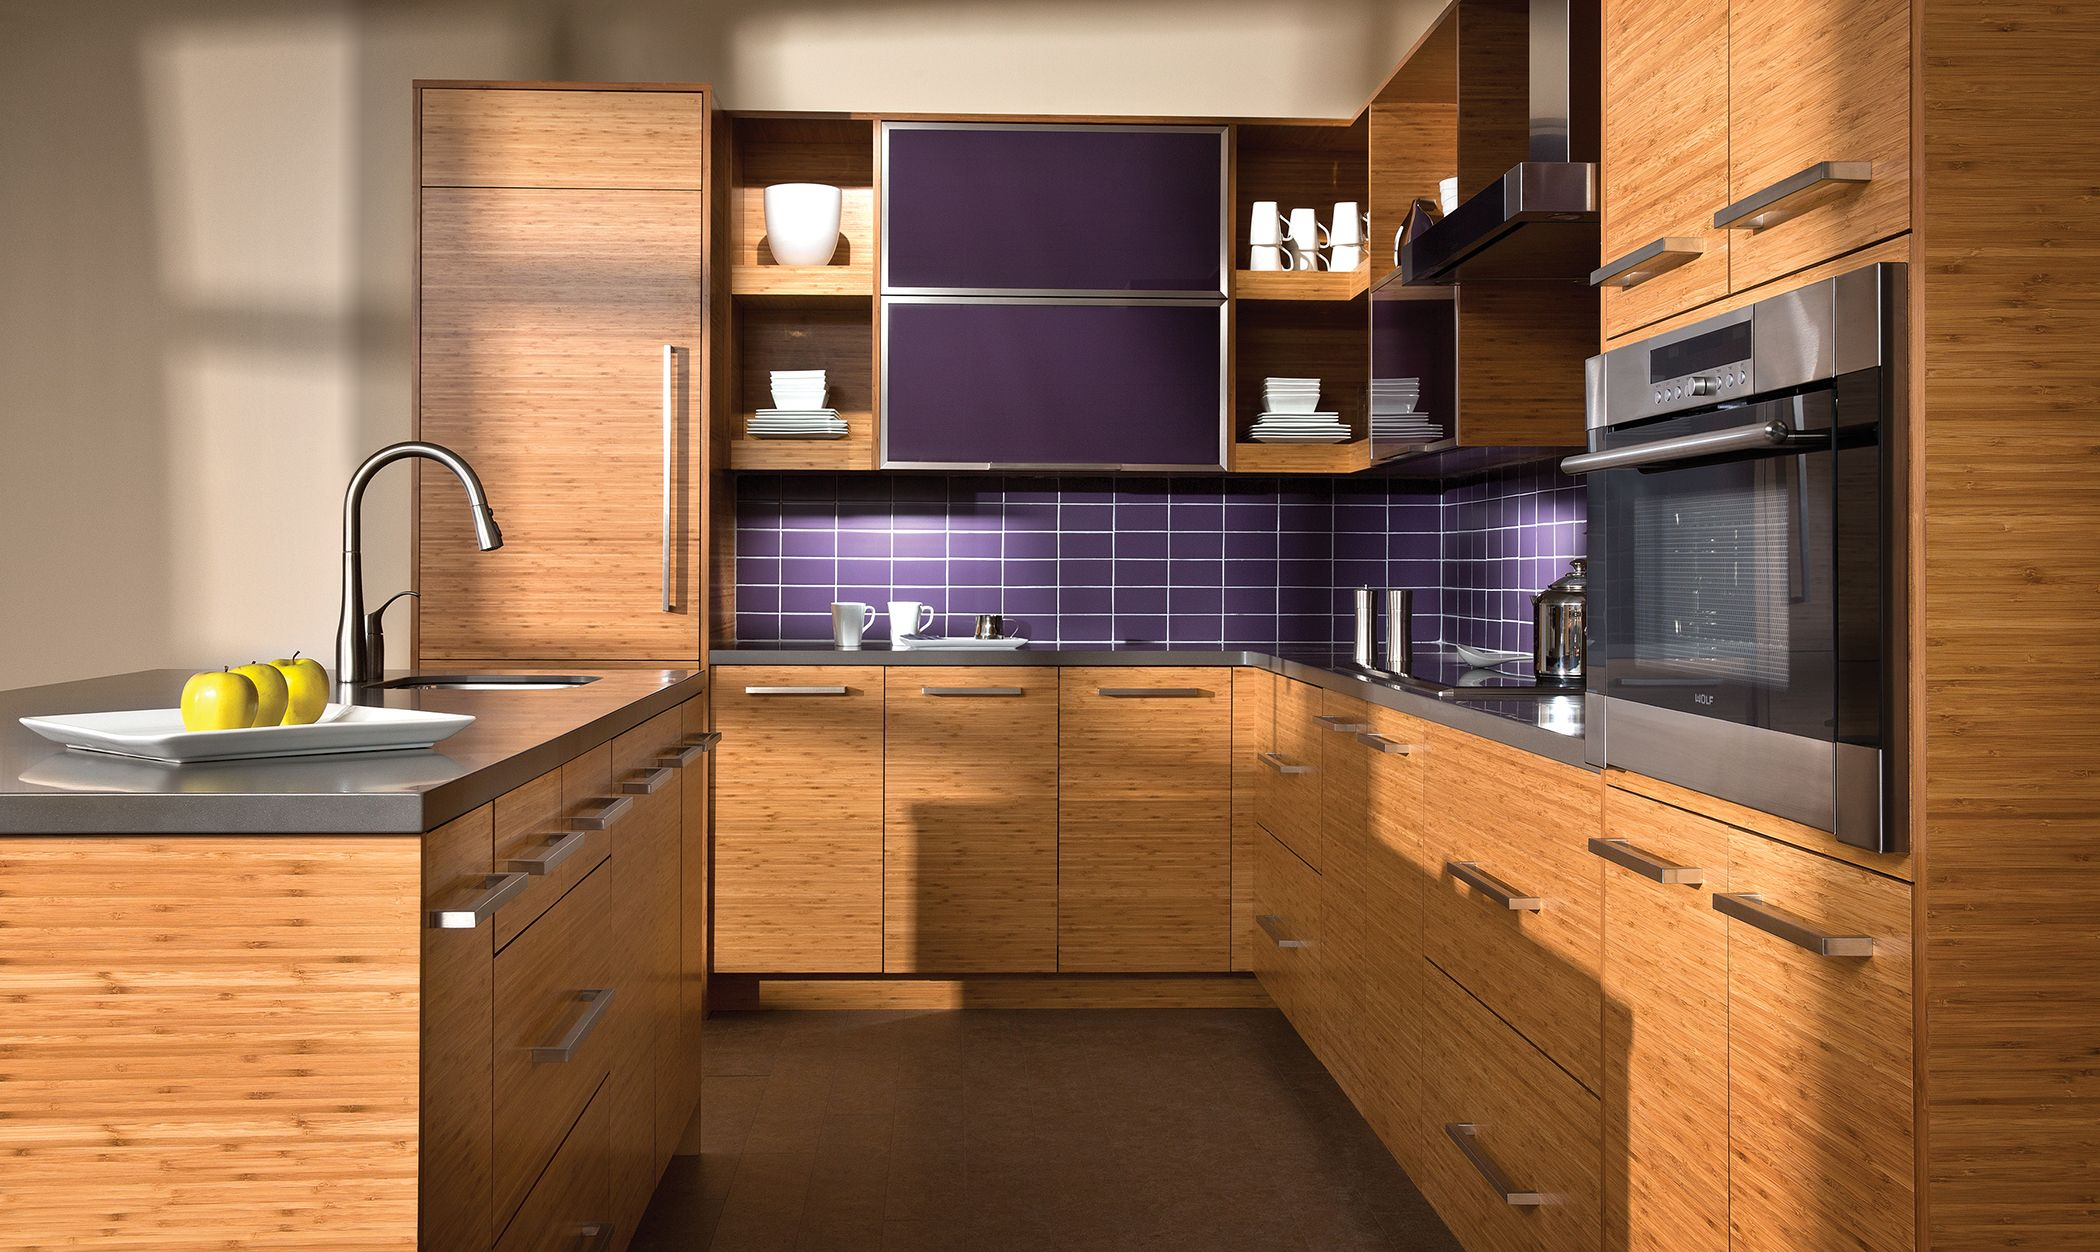 Tropical Bamboo Kitchen Design Dura Supreme Cabinetry Bamboo Cabinets Bamboo Kitchen Cabinets Kitchen Decor Modern